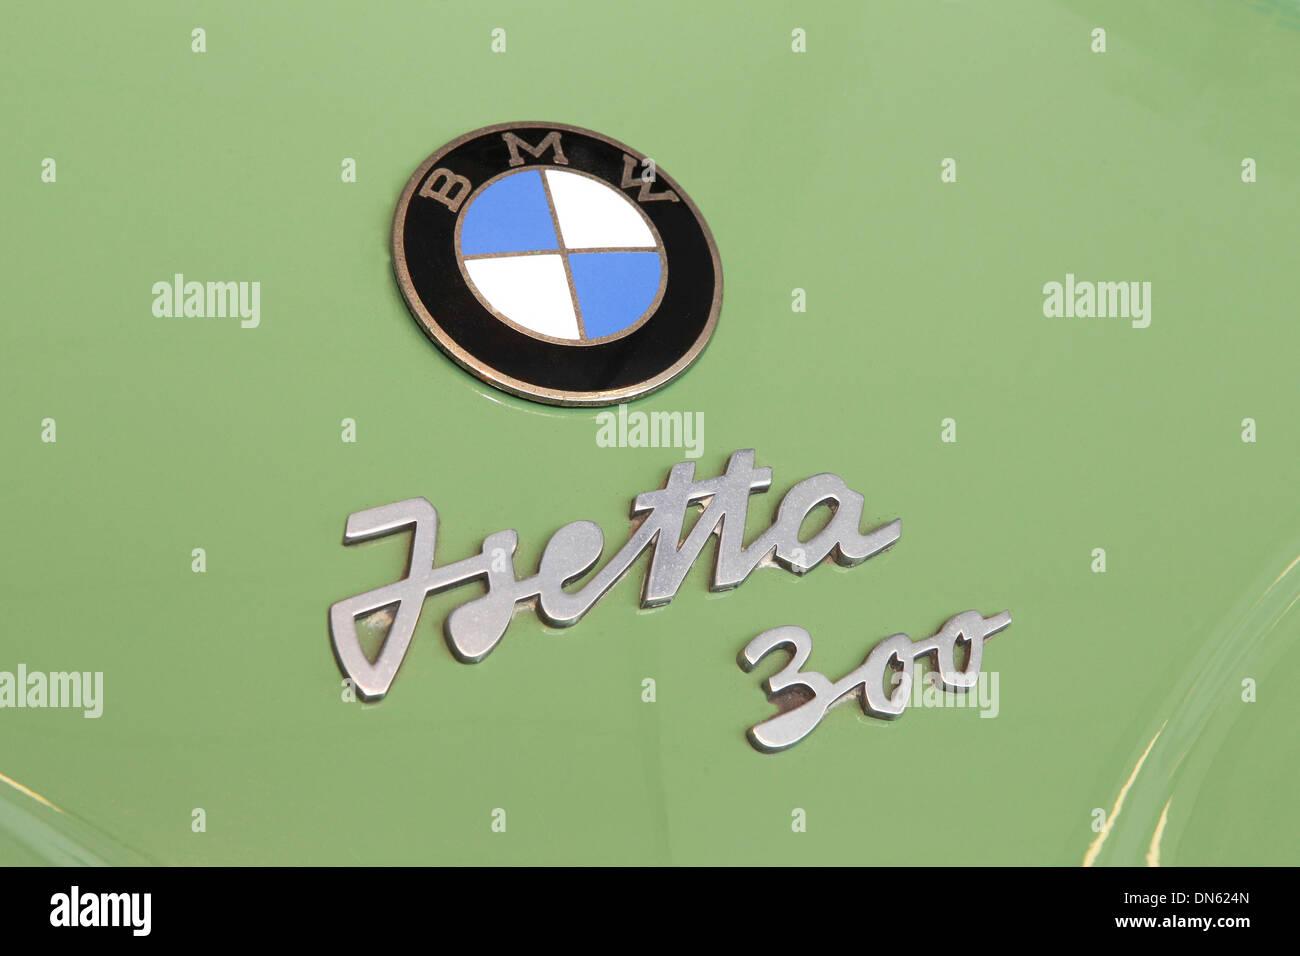 Isetta Stock Photos Amp Isetta Stock Images Alamy